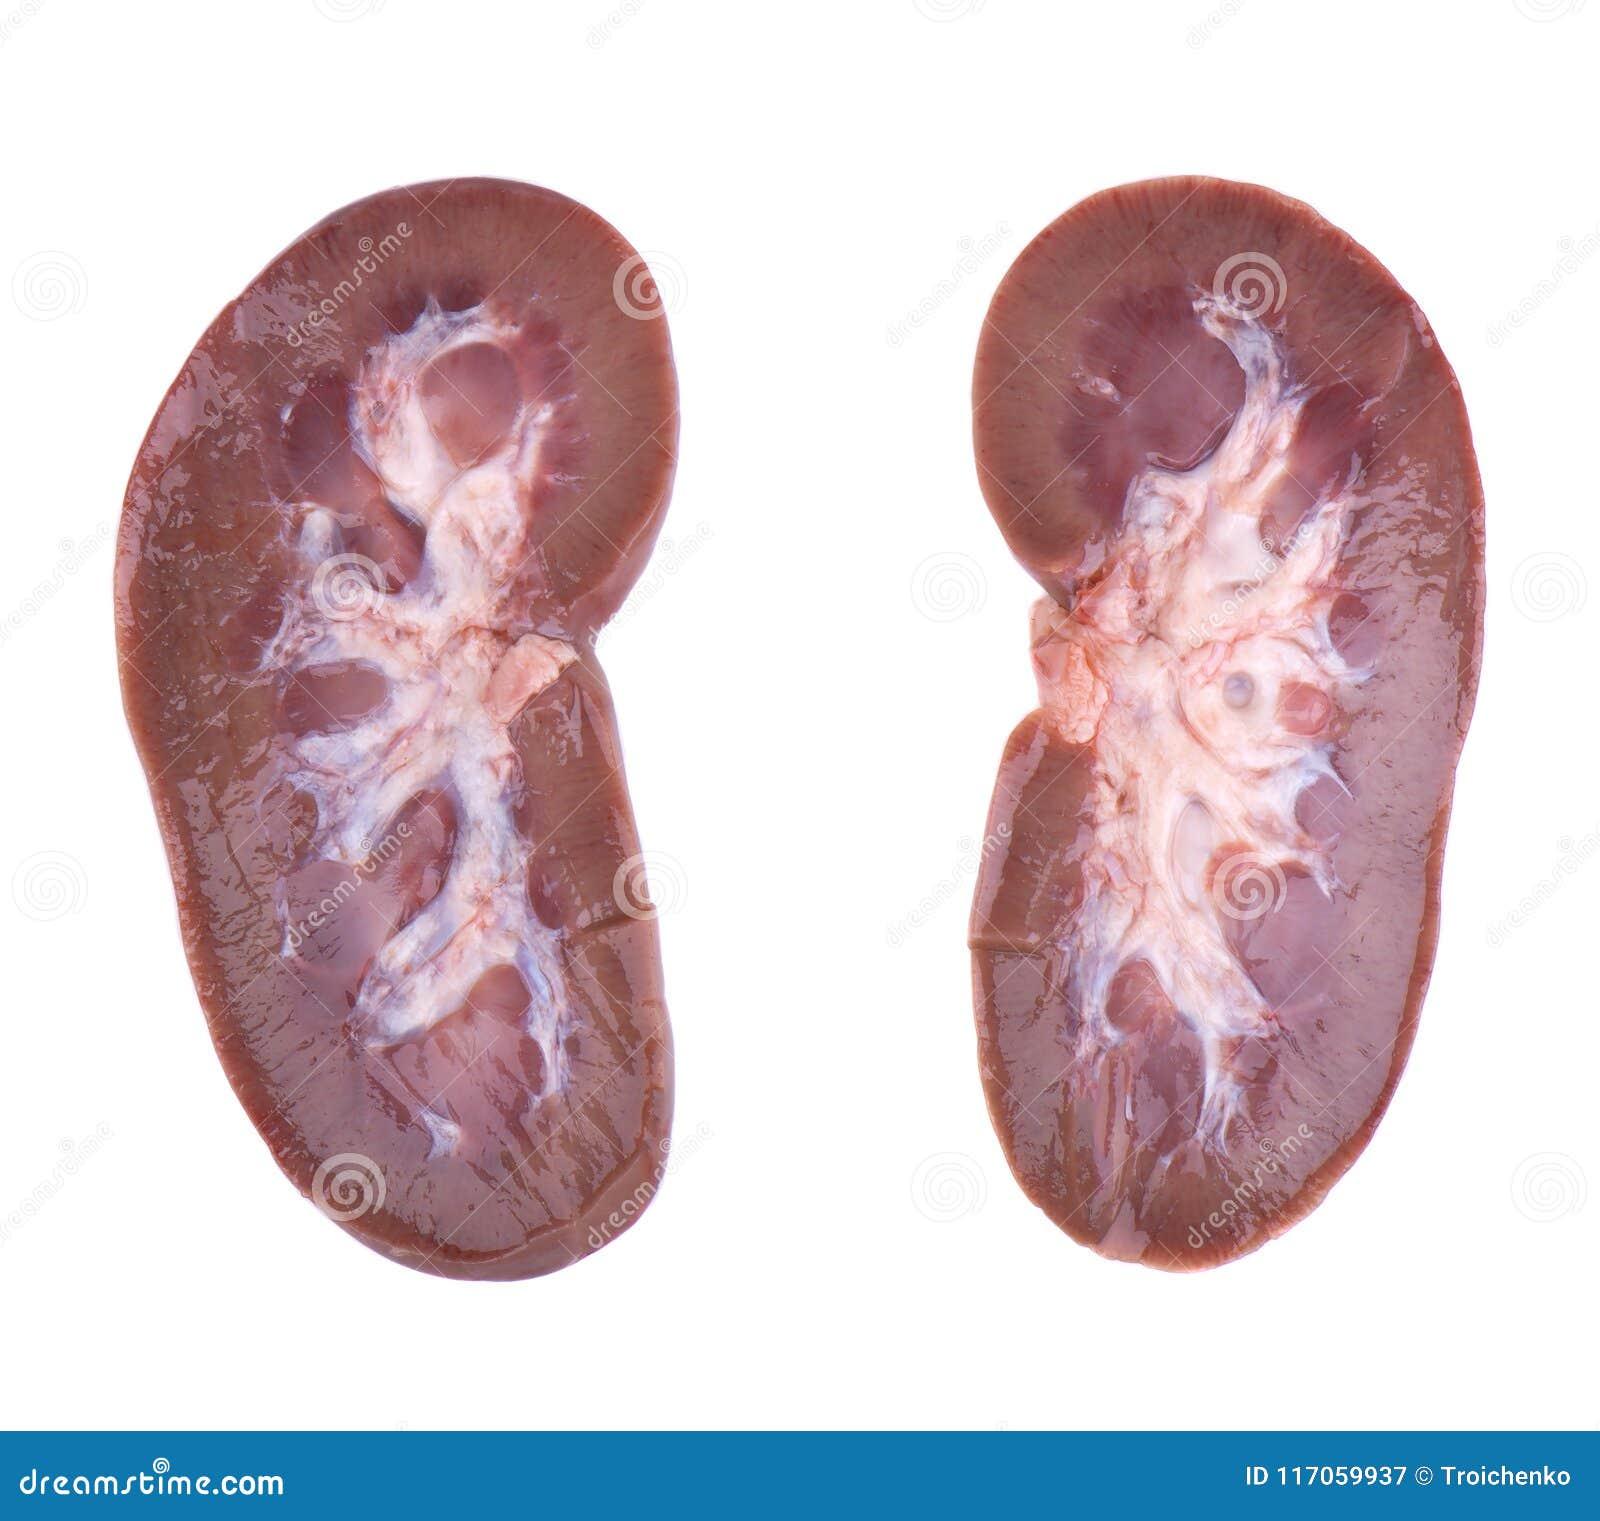 Pork Kidney Raw Isolated On White Background Closeup Pig Kidney